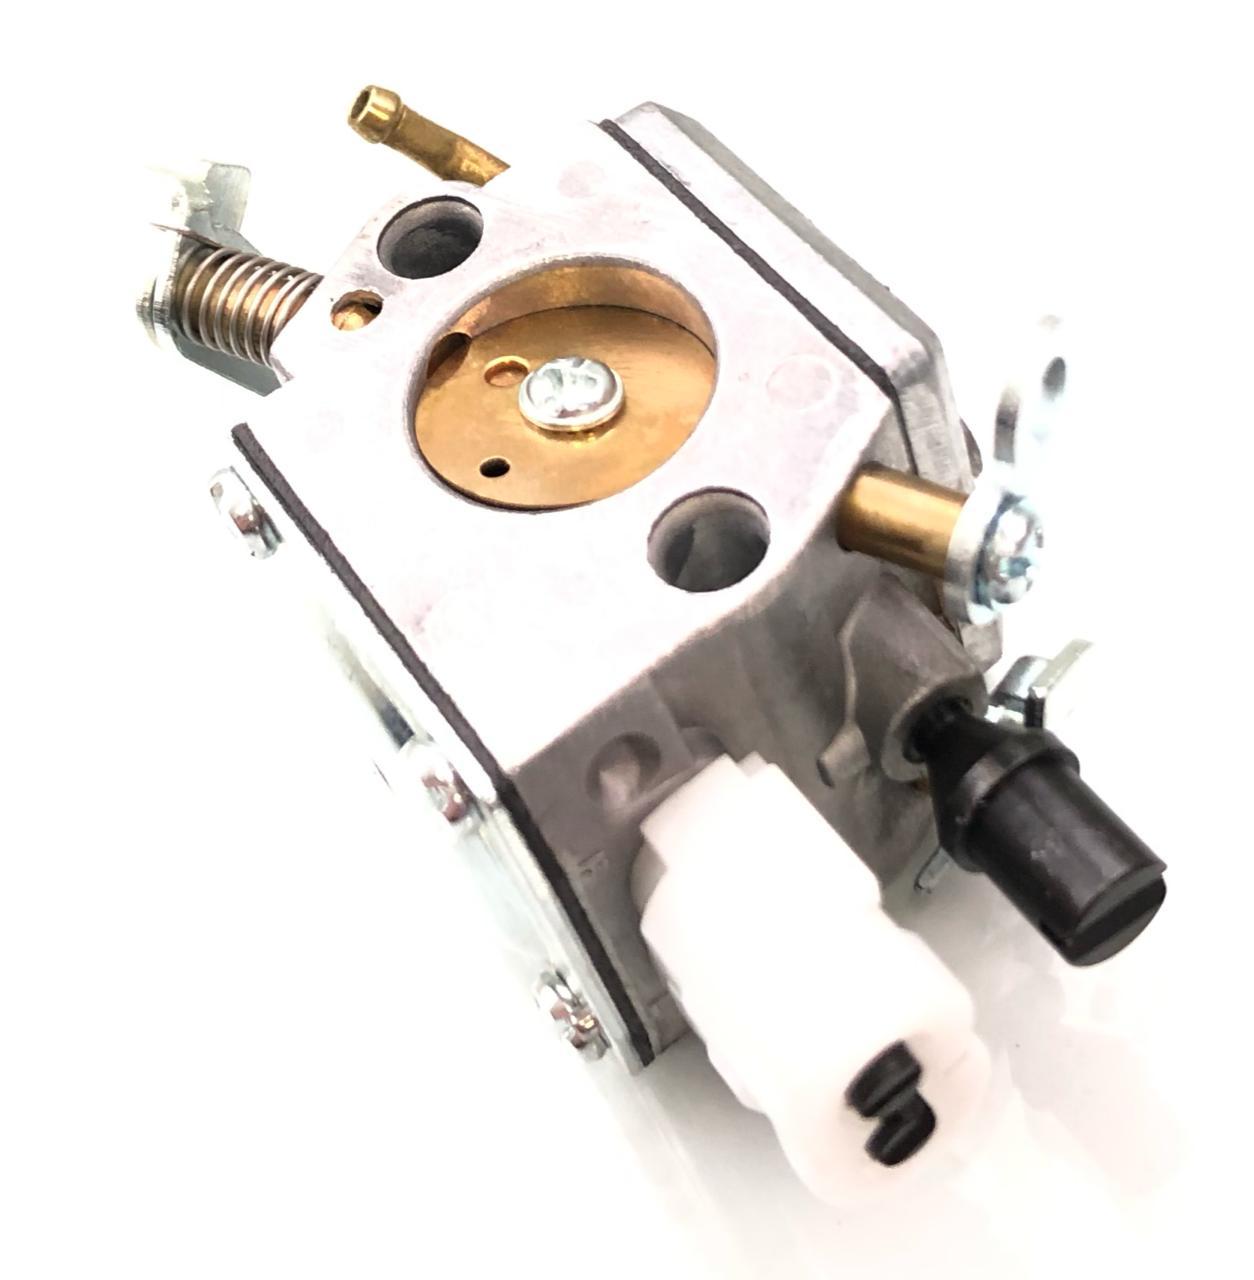 Comprar Carburador intertec hq-357/359